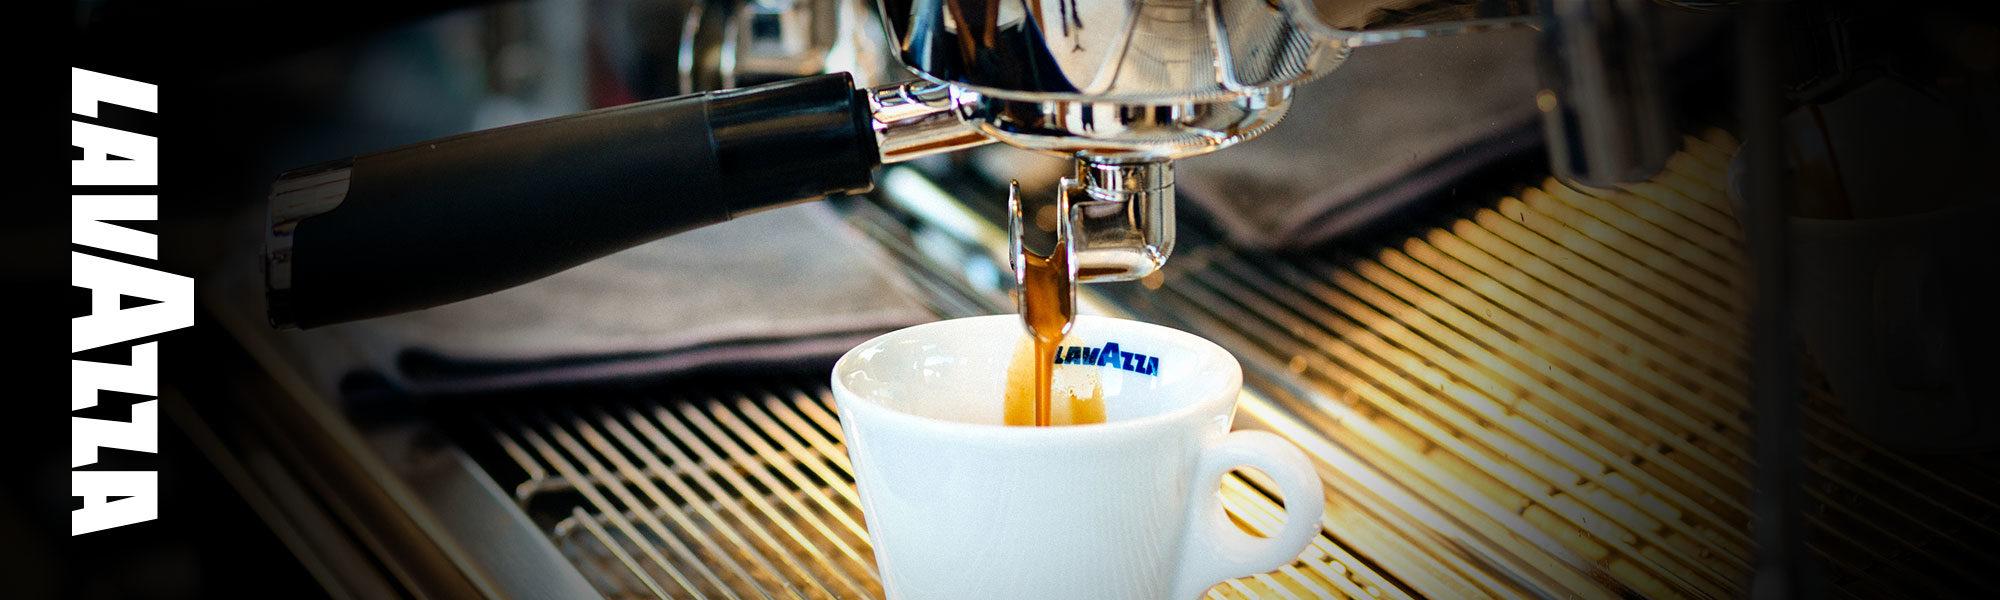 lavazza espresso aparat kava